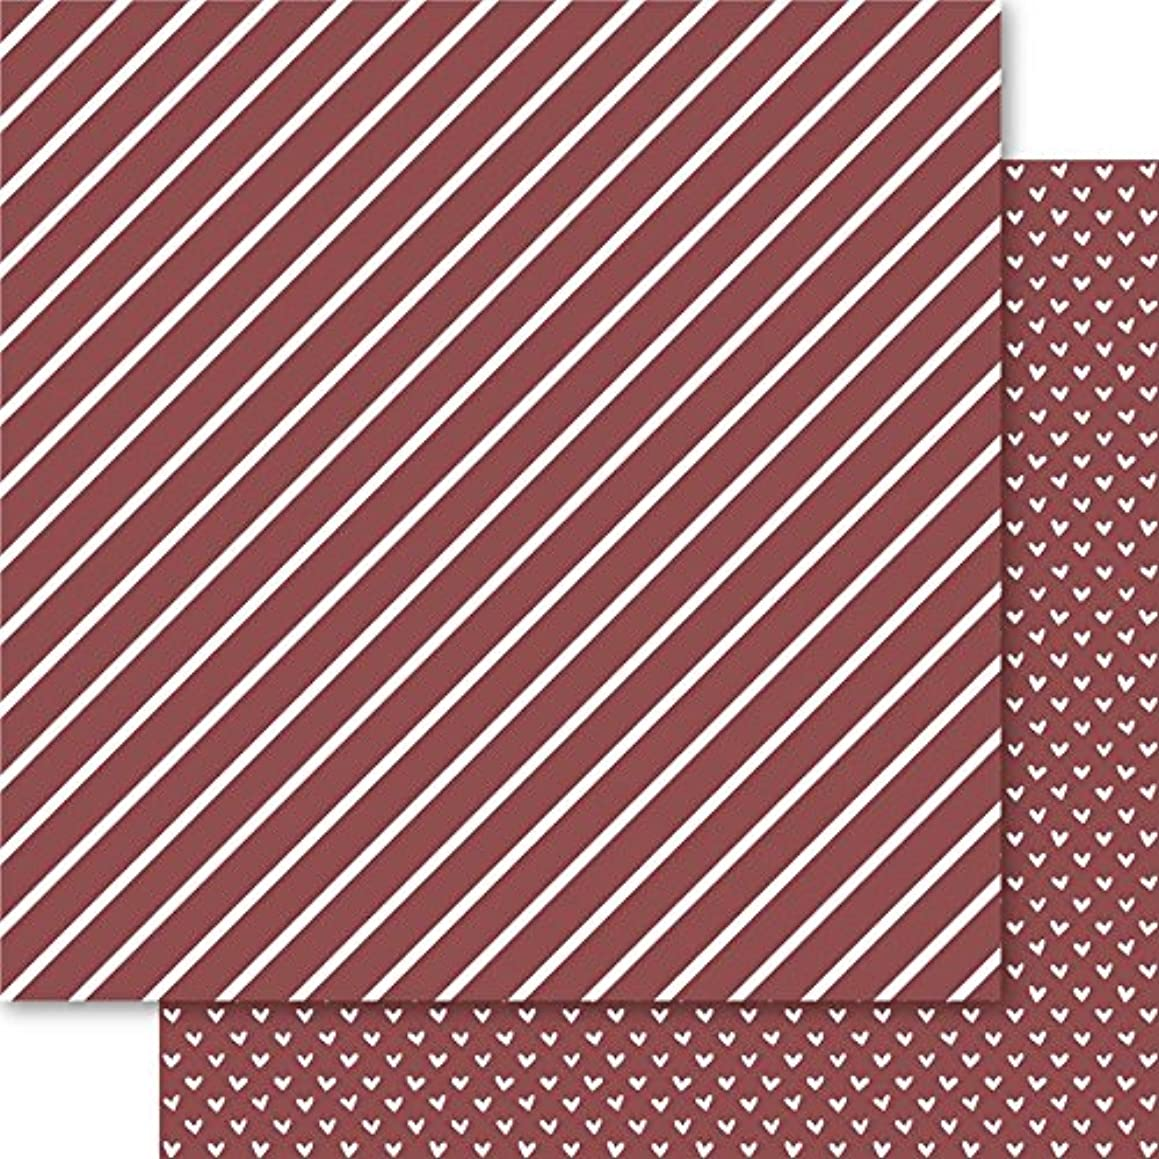 Ruby Rock-It Bella Hearts & Stripes Foiled Cardstock 12